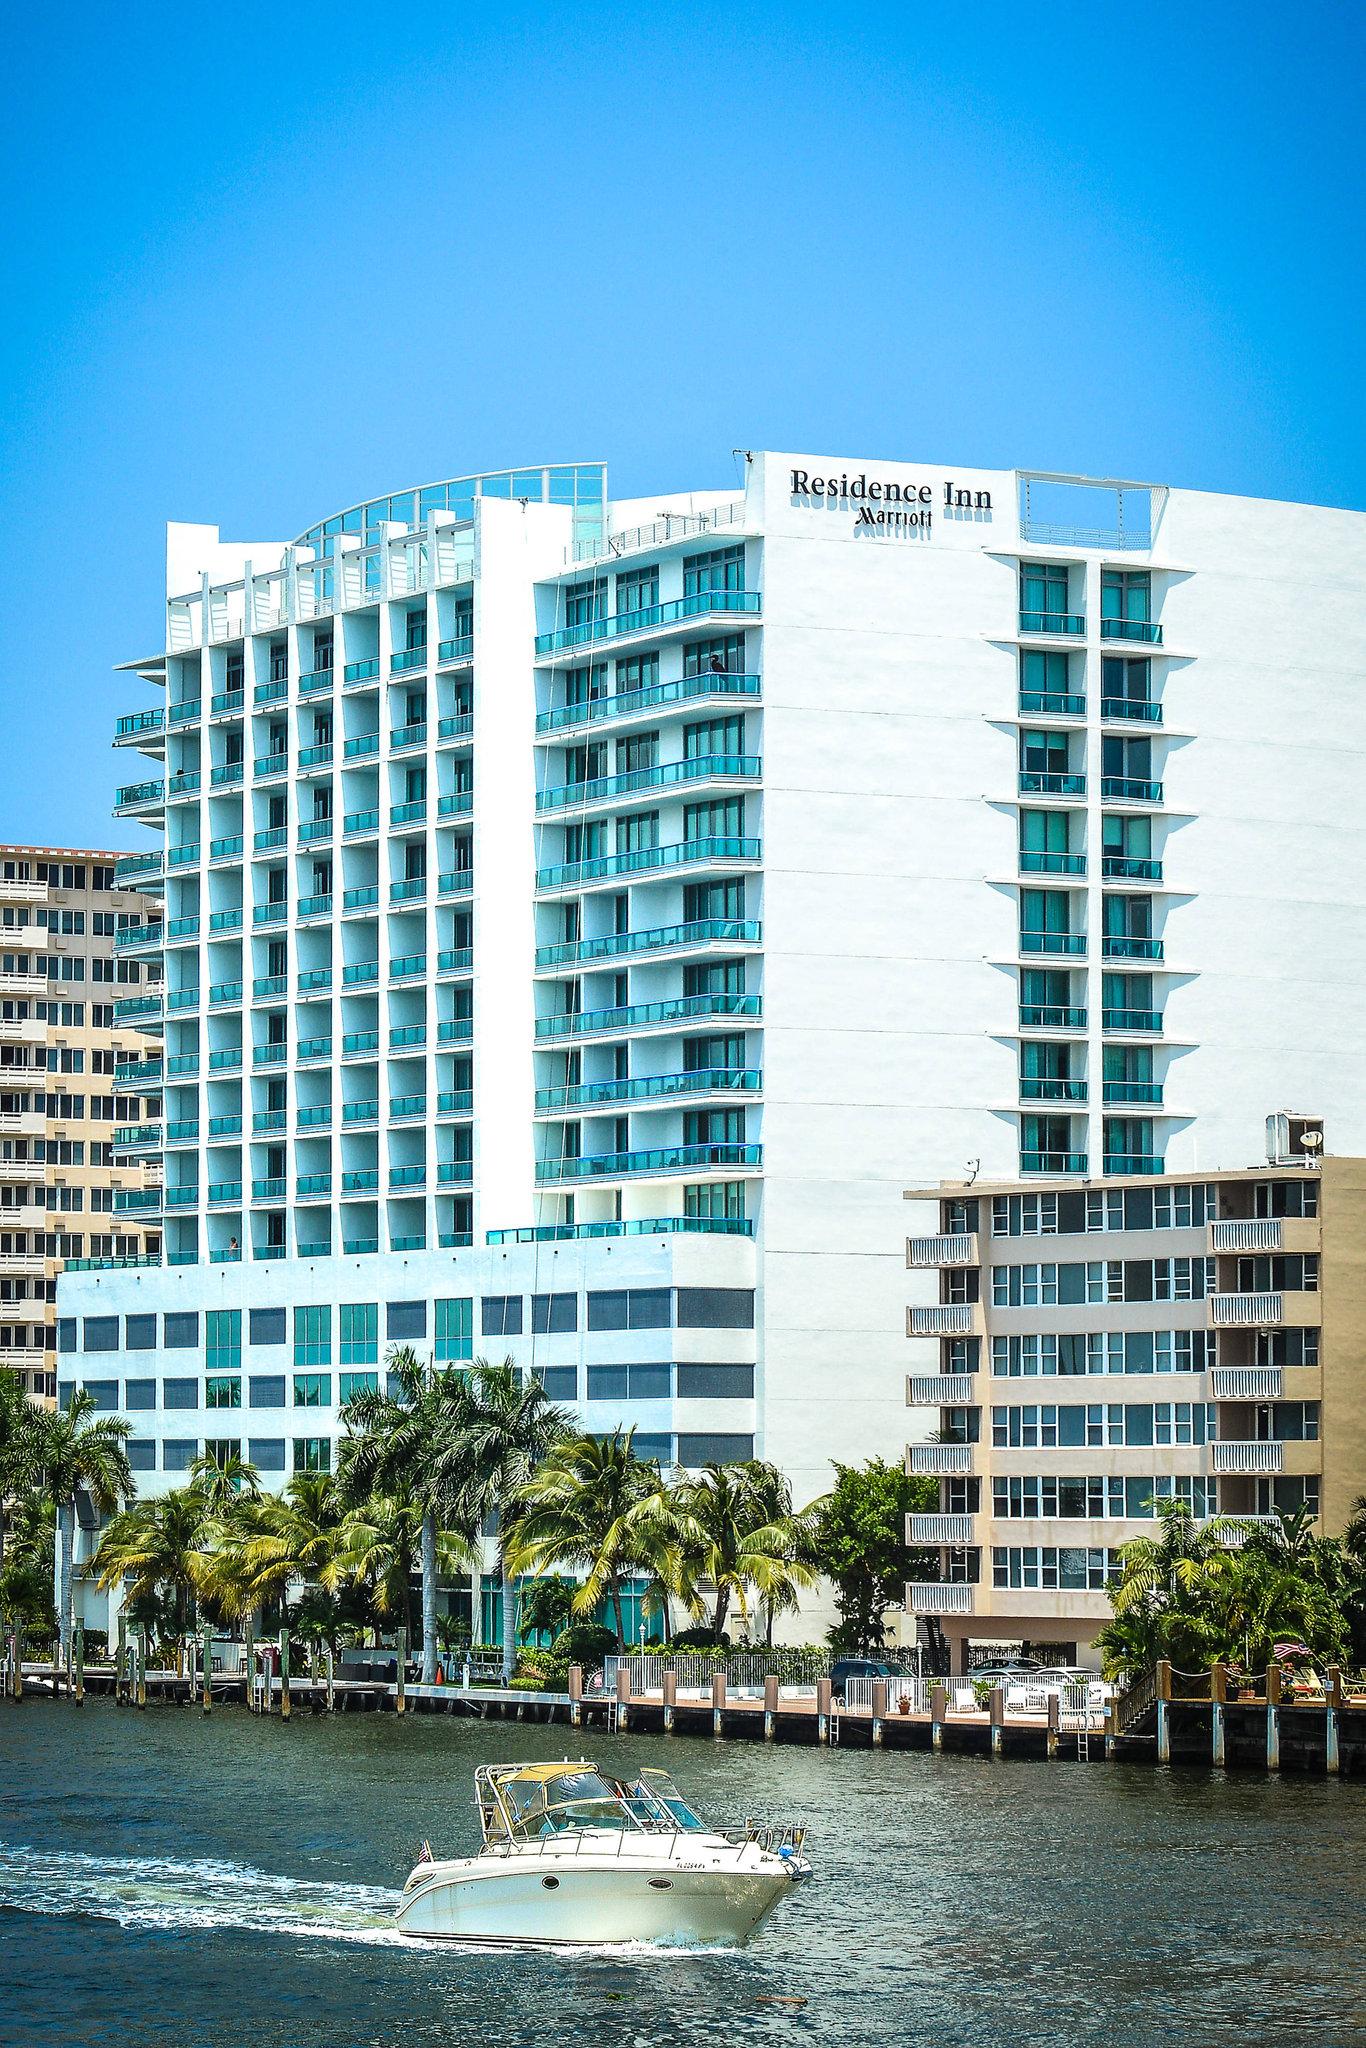 Residence Inn Fort Lauderdale Intracoast